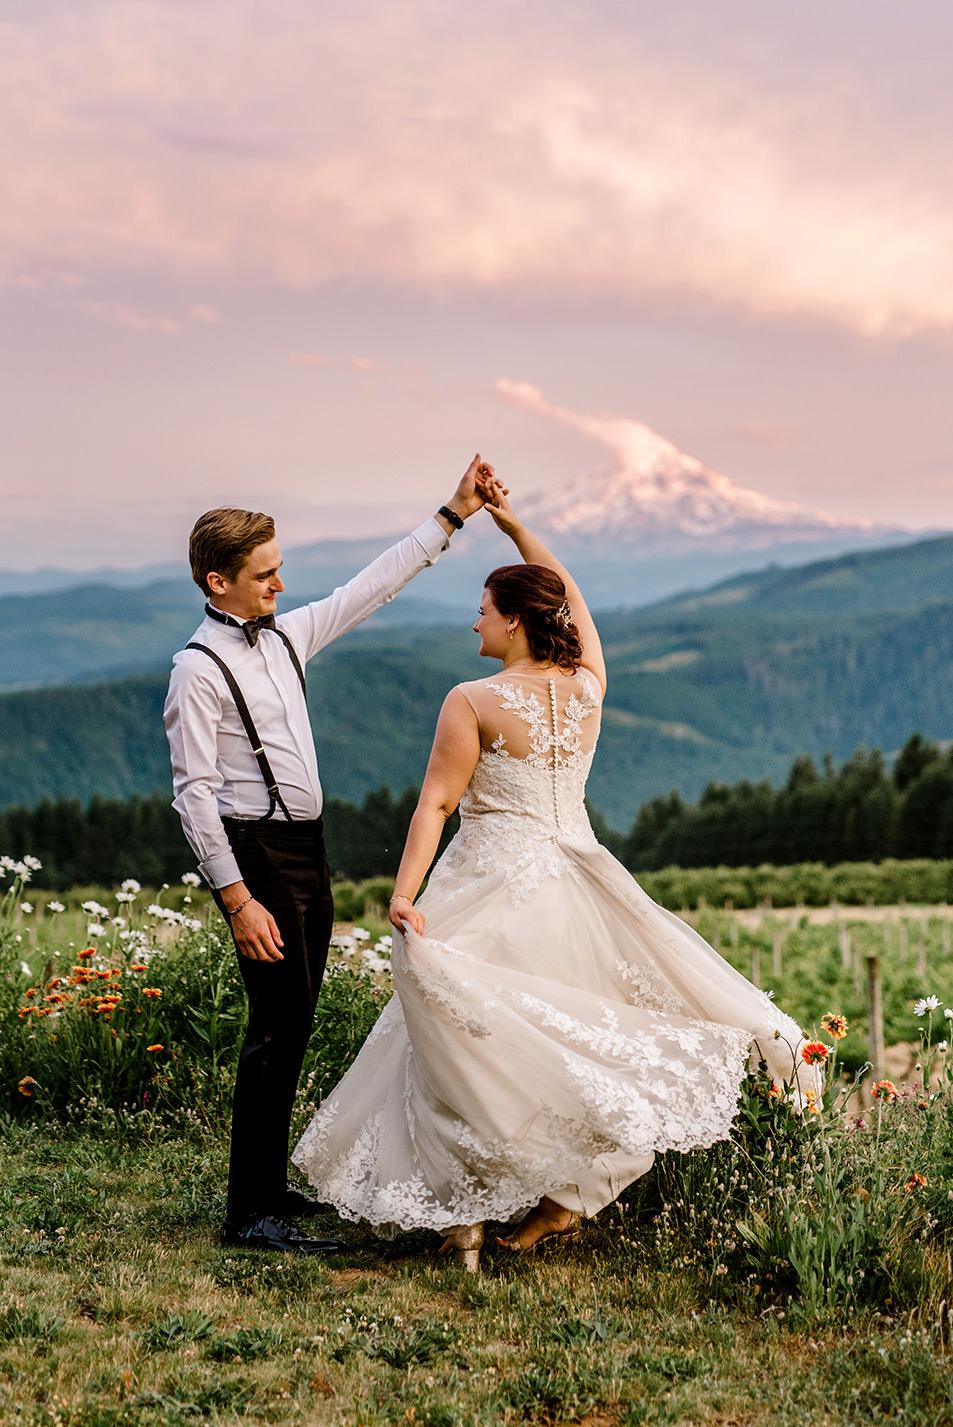 Citrus-inspired-wedding-at-Gorge-Crest-Vineyard-119.jpg